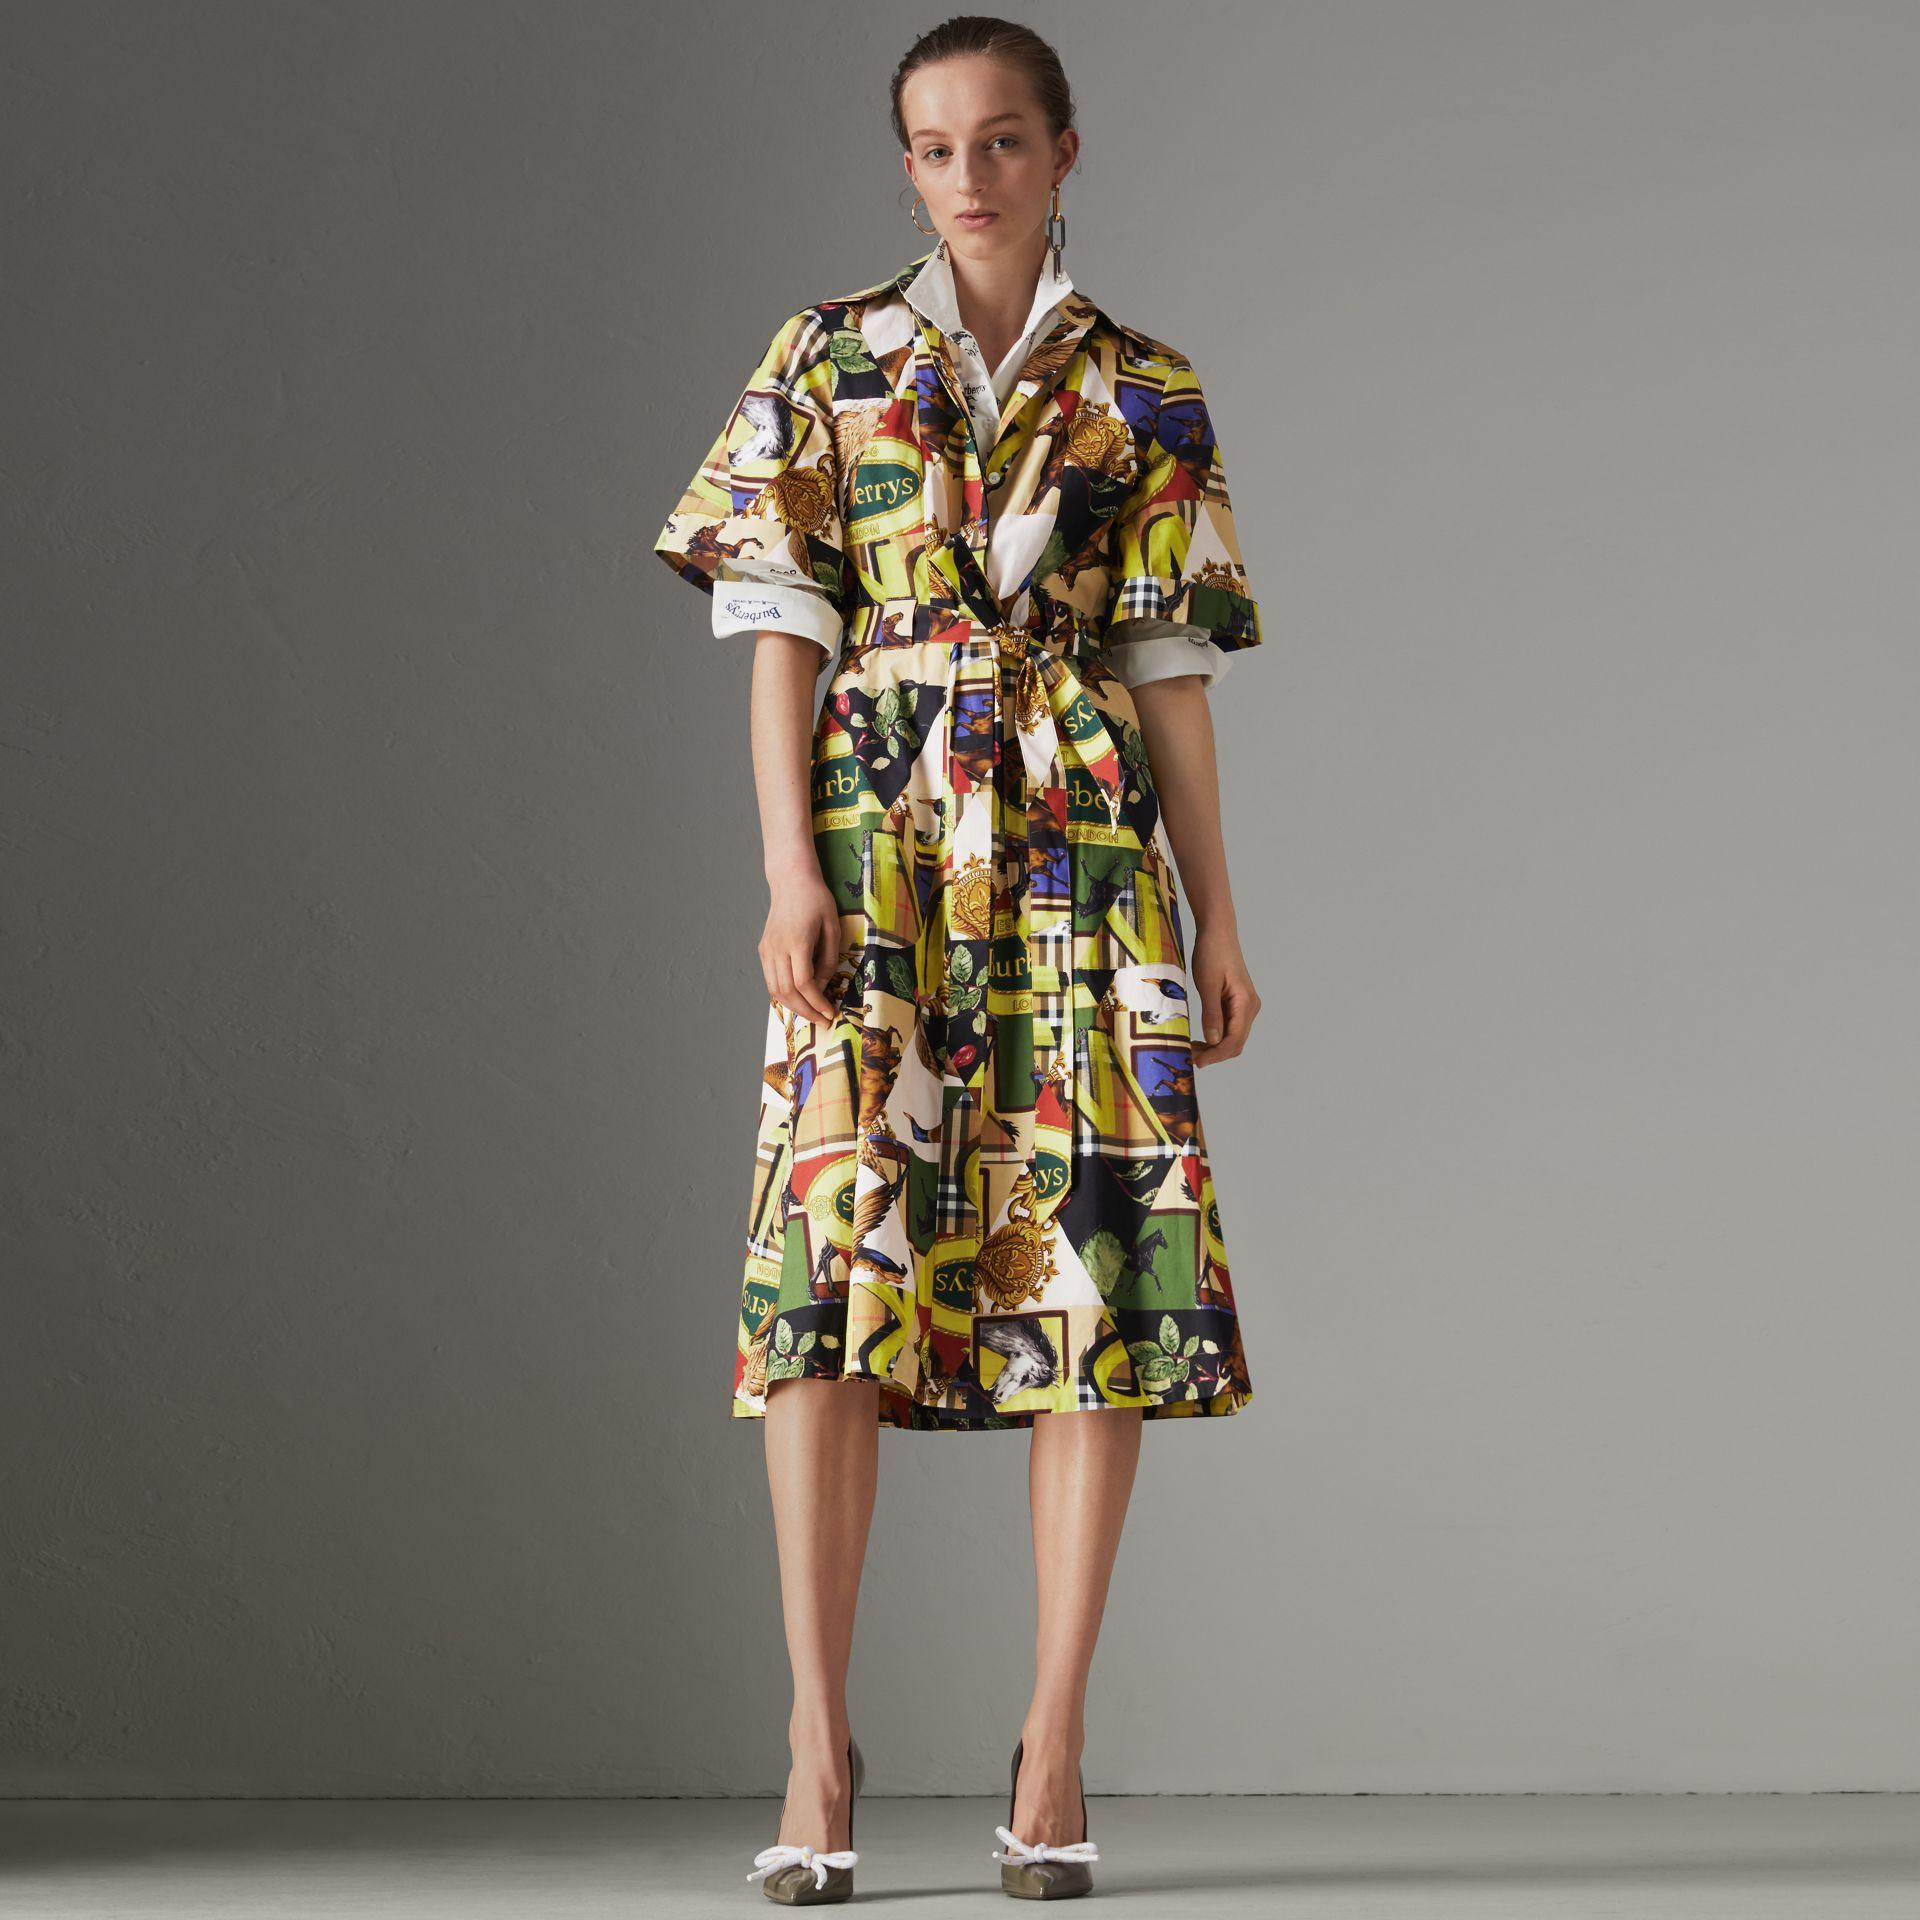 ec531a831f1e Burberry Graffitied Archive Scarf Print Shirt Dress In Multicolour ...